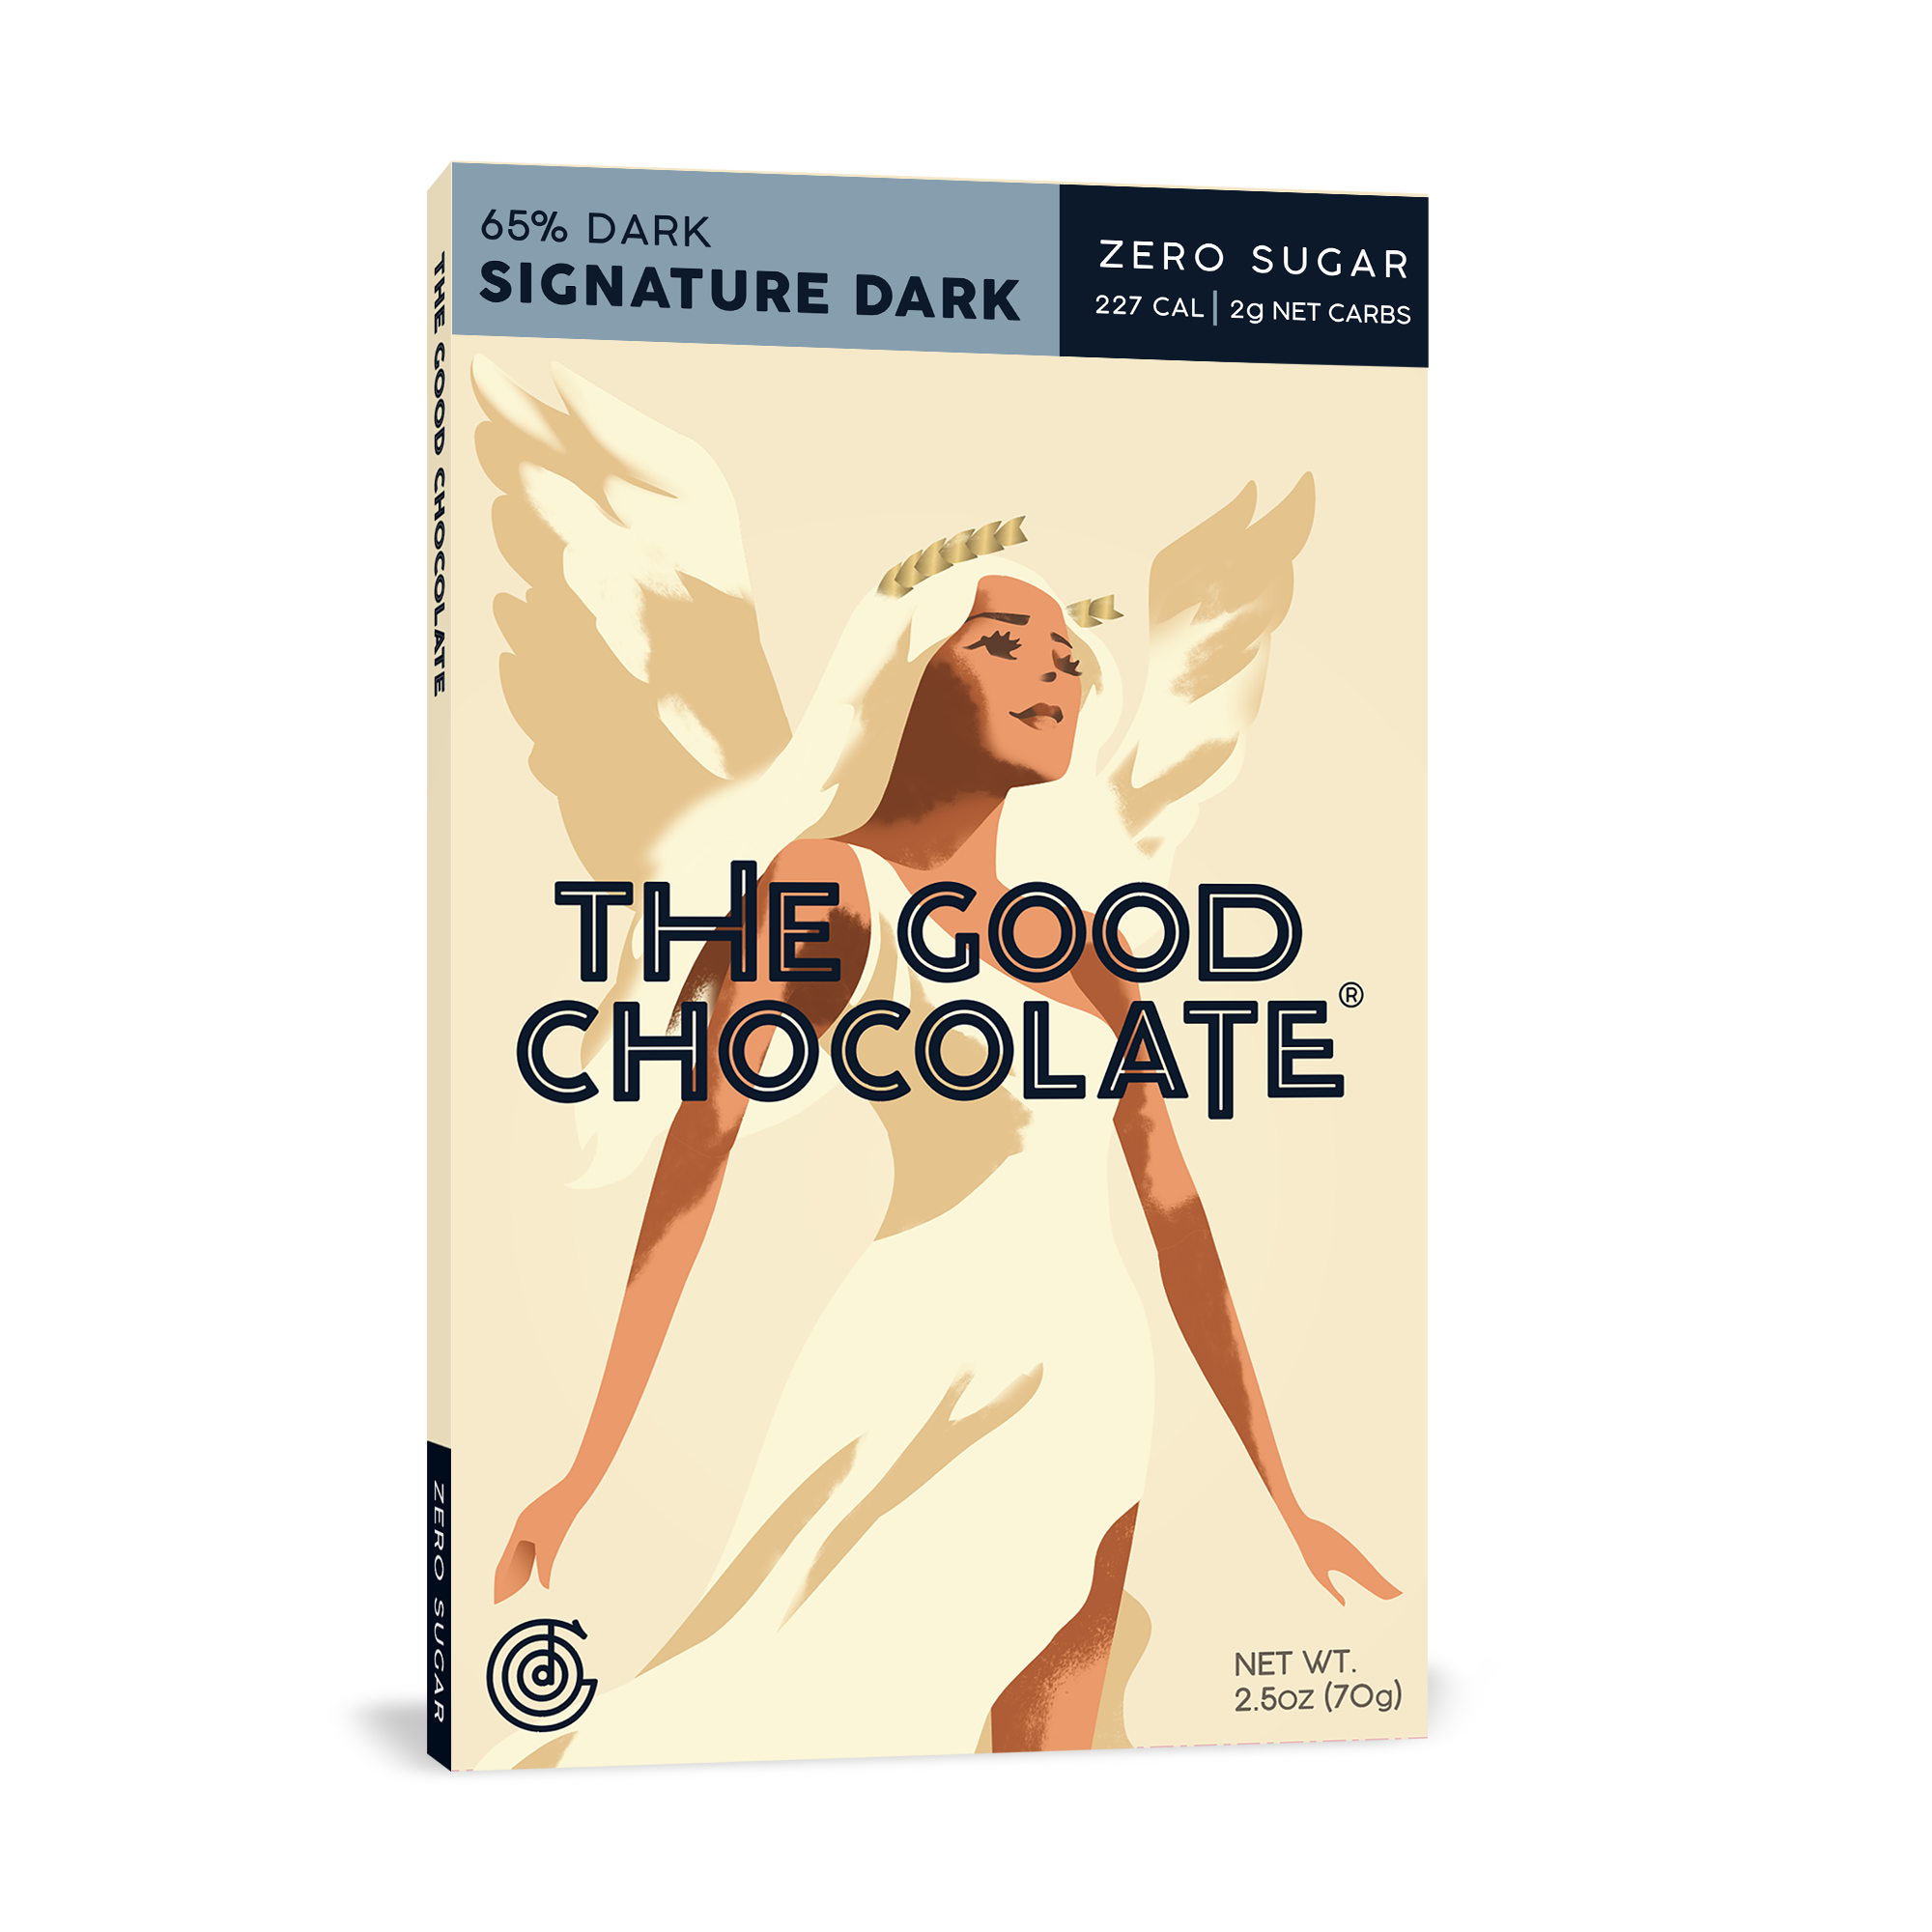 The Good Chocolate Signature Dark